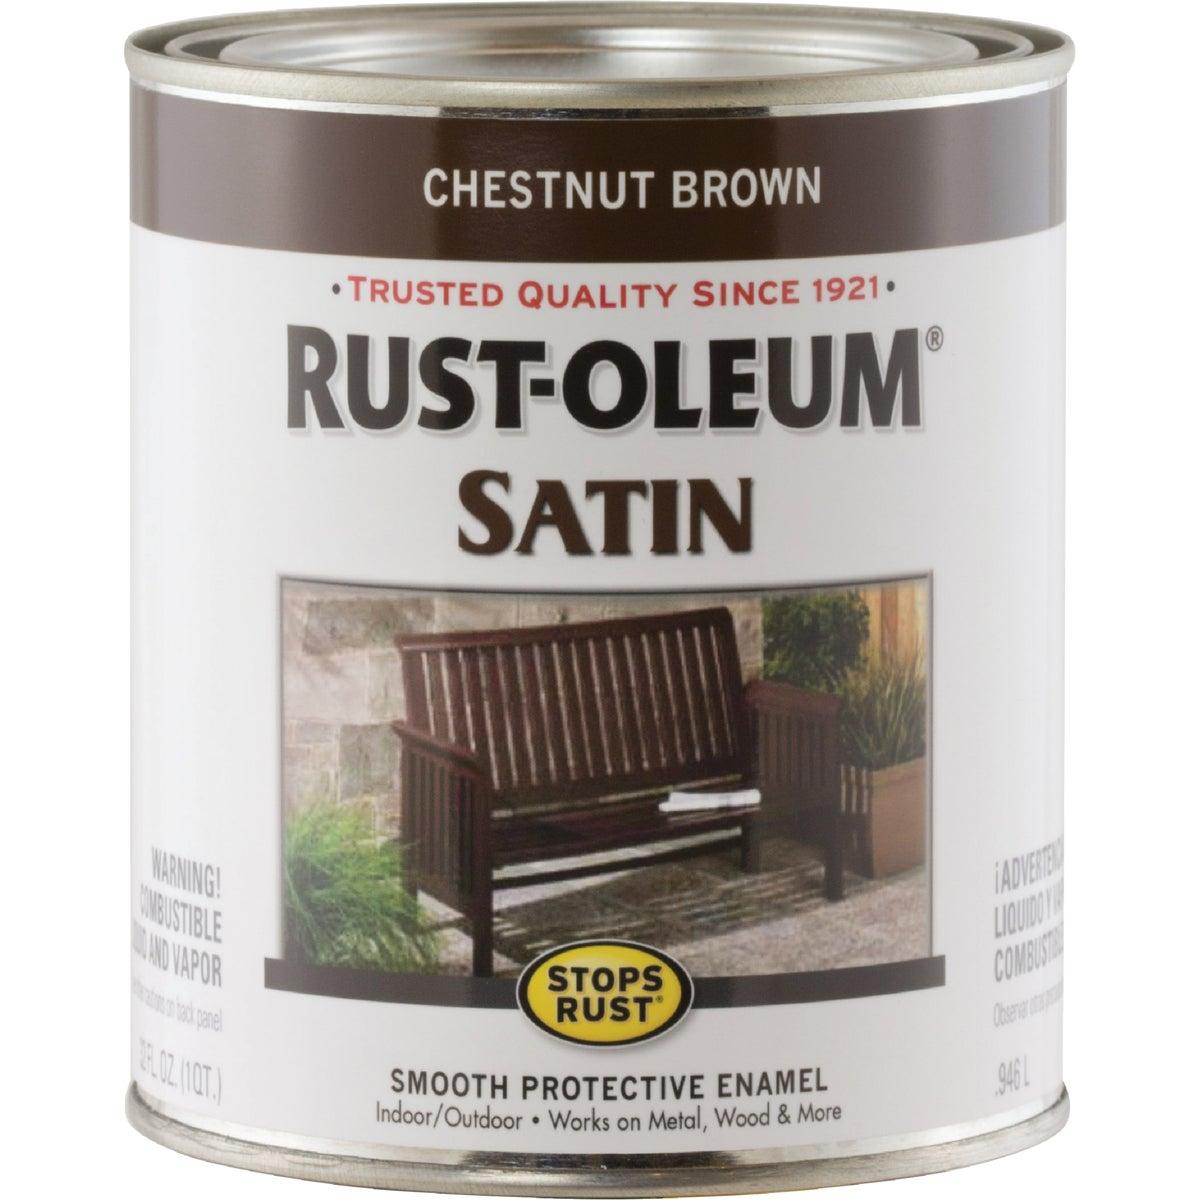 SAT CHESTNT BROWN ENAMEL - 7774502 by Rustoleum